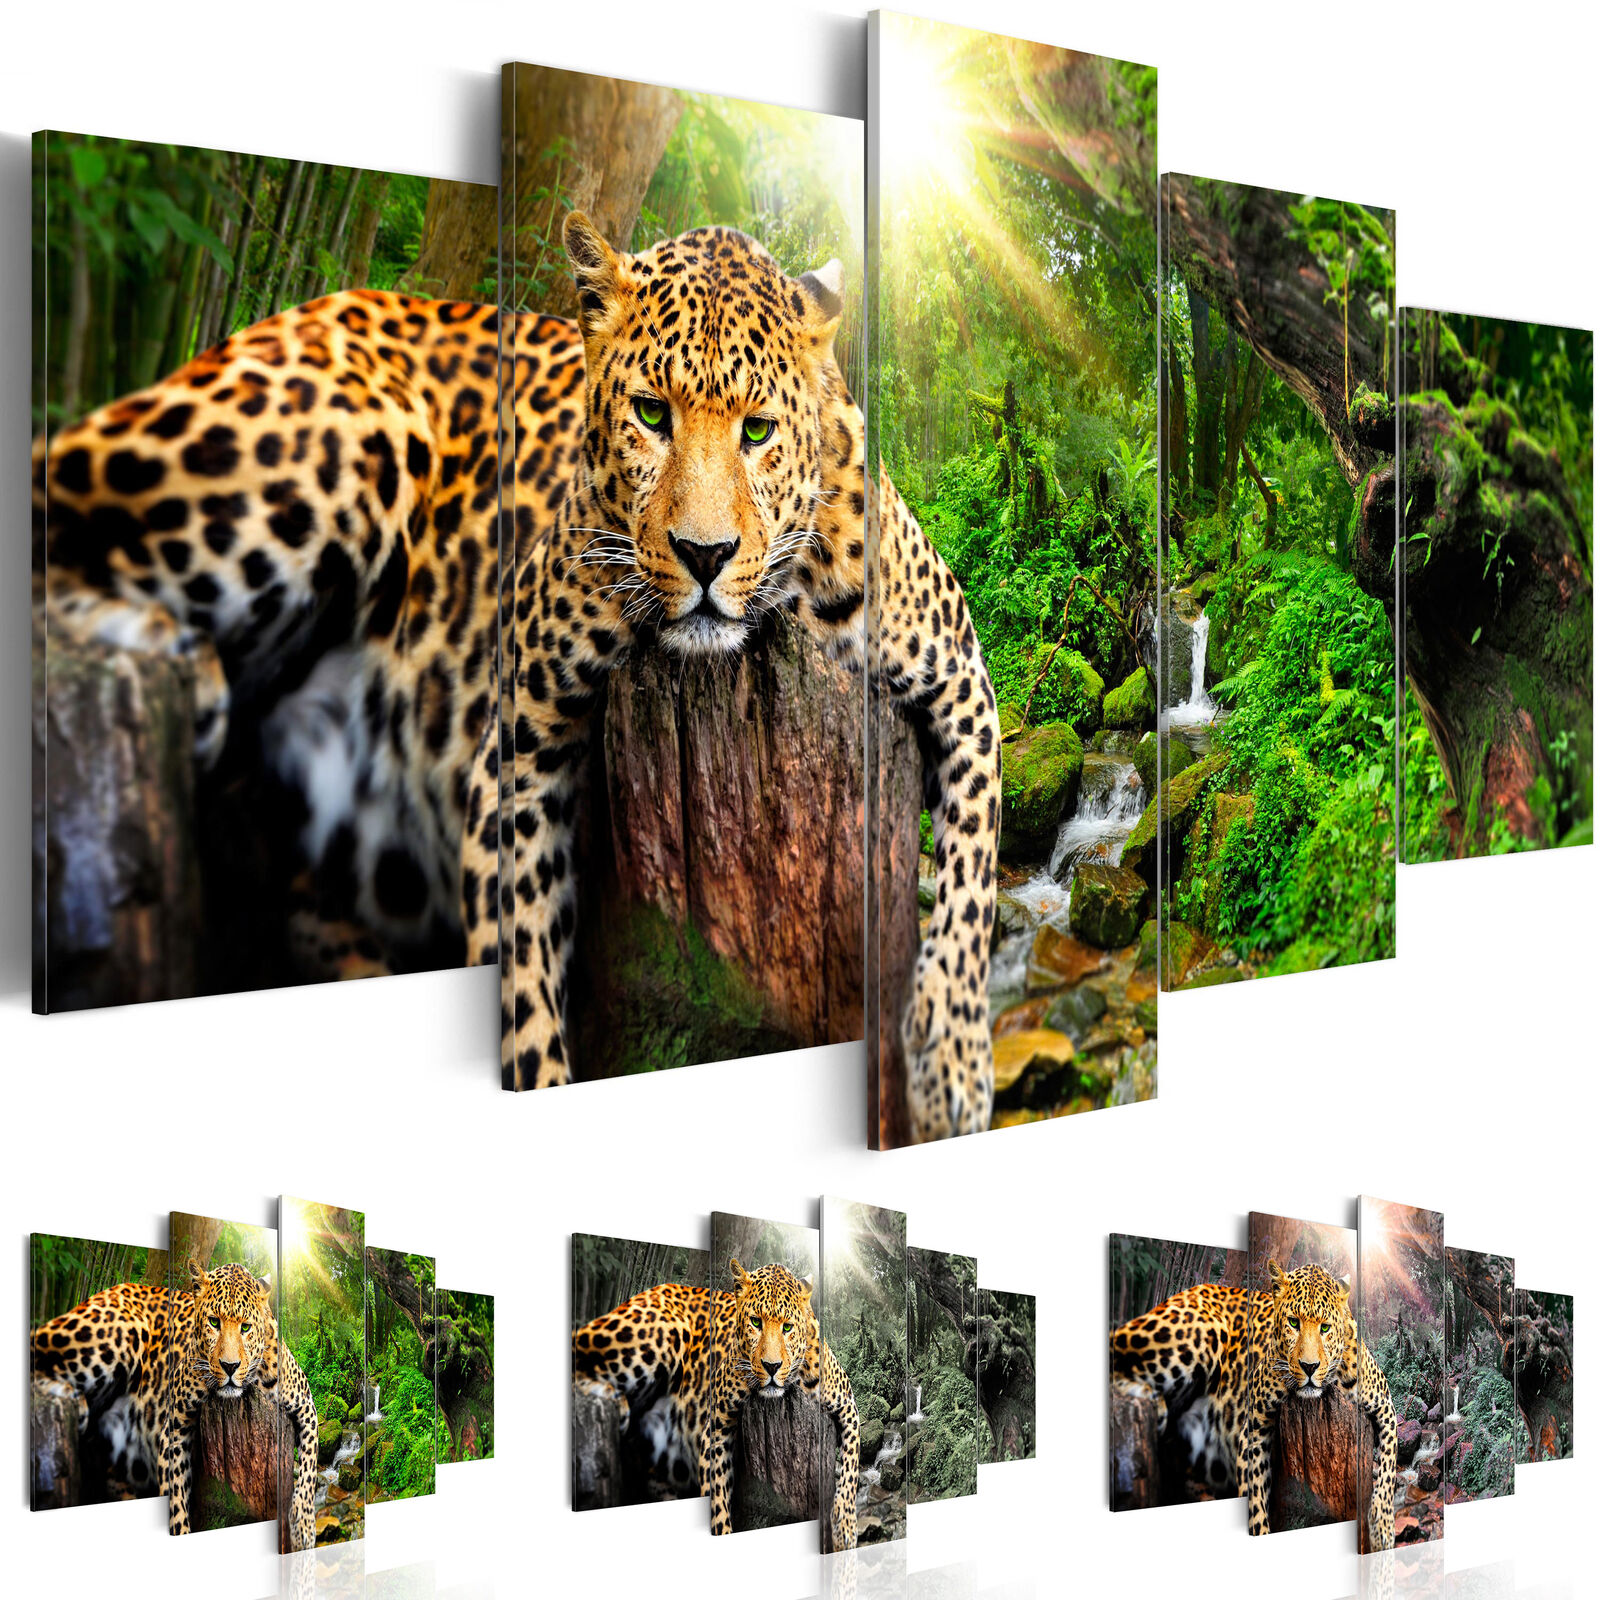 Acrylglasbild Leopard moderne Wandbilder xxl Tiere natur 5 tlg Bild g-C-0031-k-n